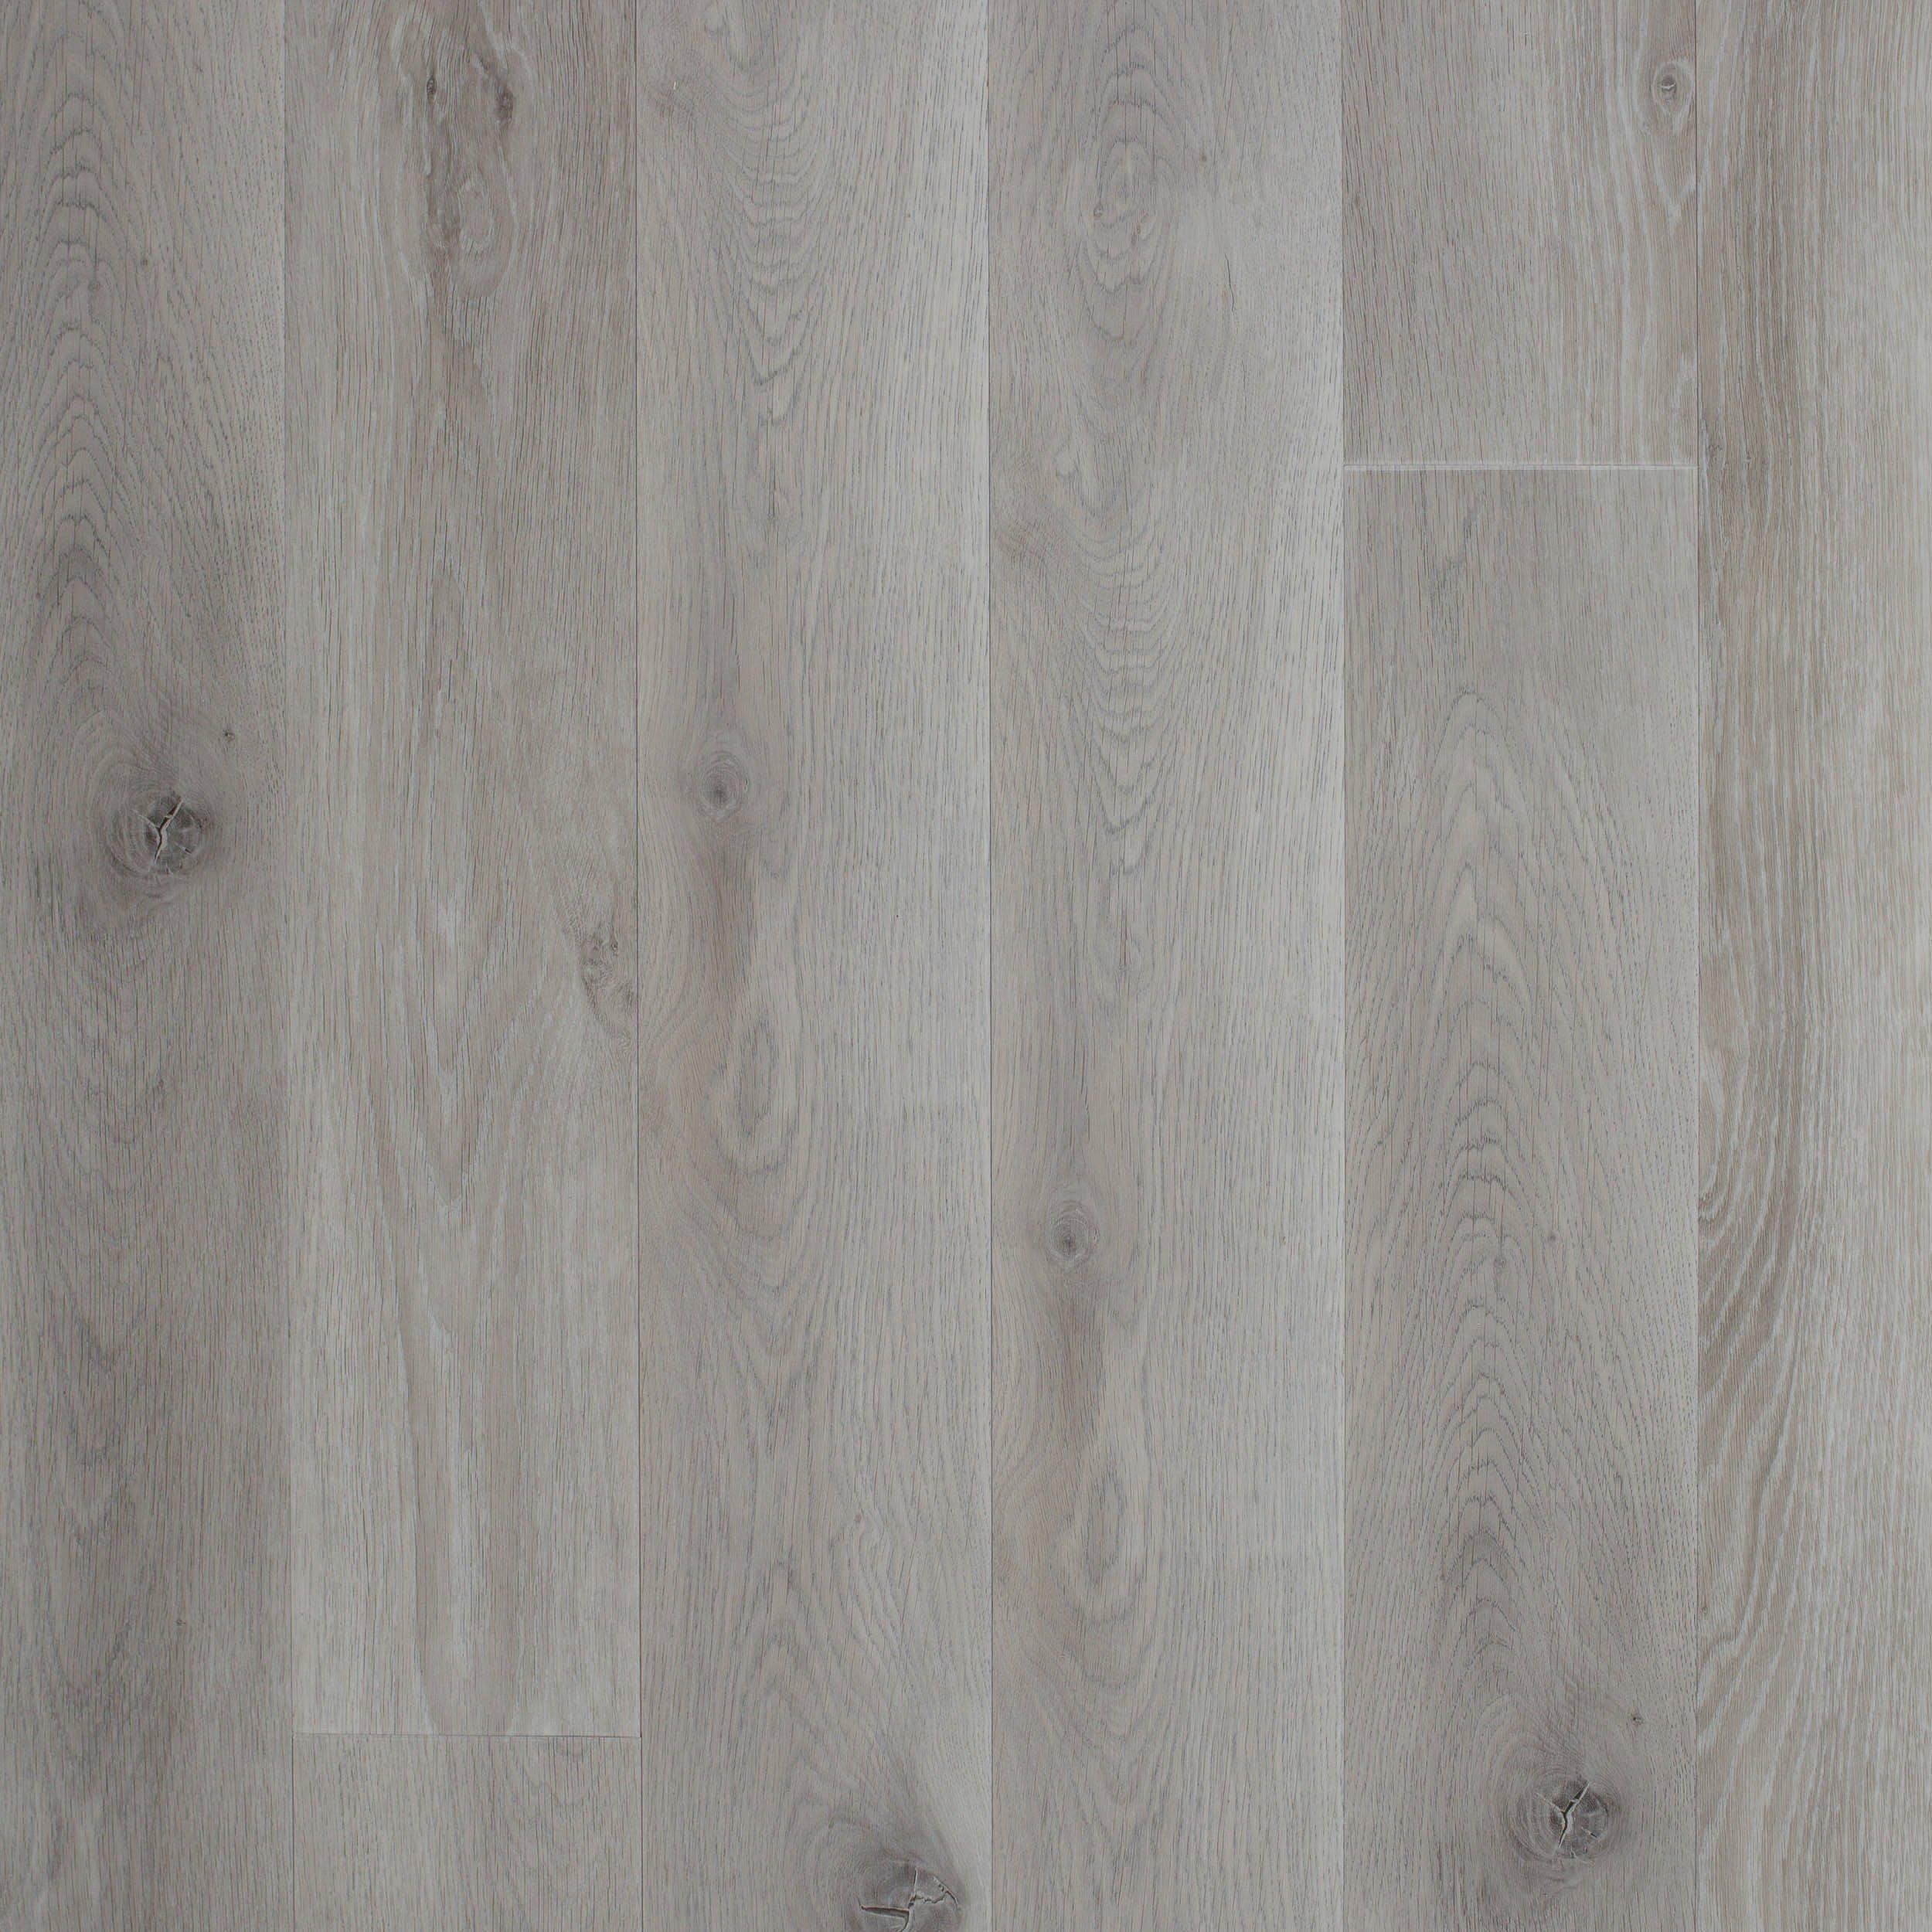 Gray High Gloss Rigid Core Luxury Vinyl Plank Cork Back Luxury Vinyl Plank Vinyl Plank Waterproof Flooring